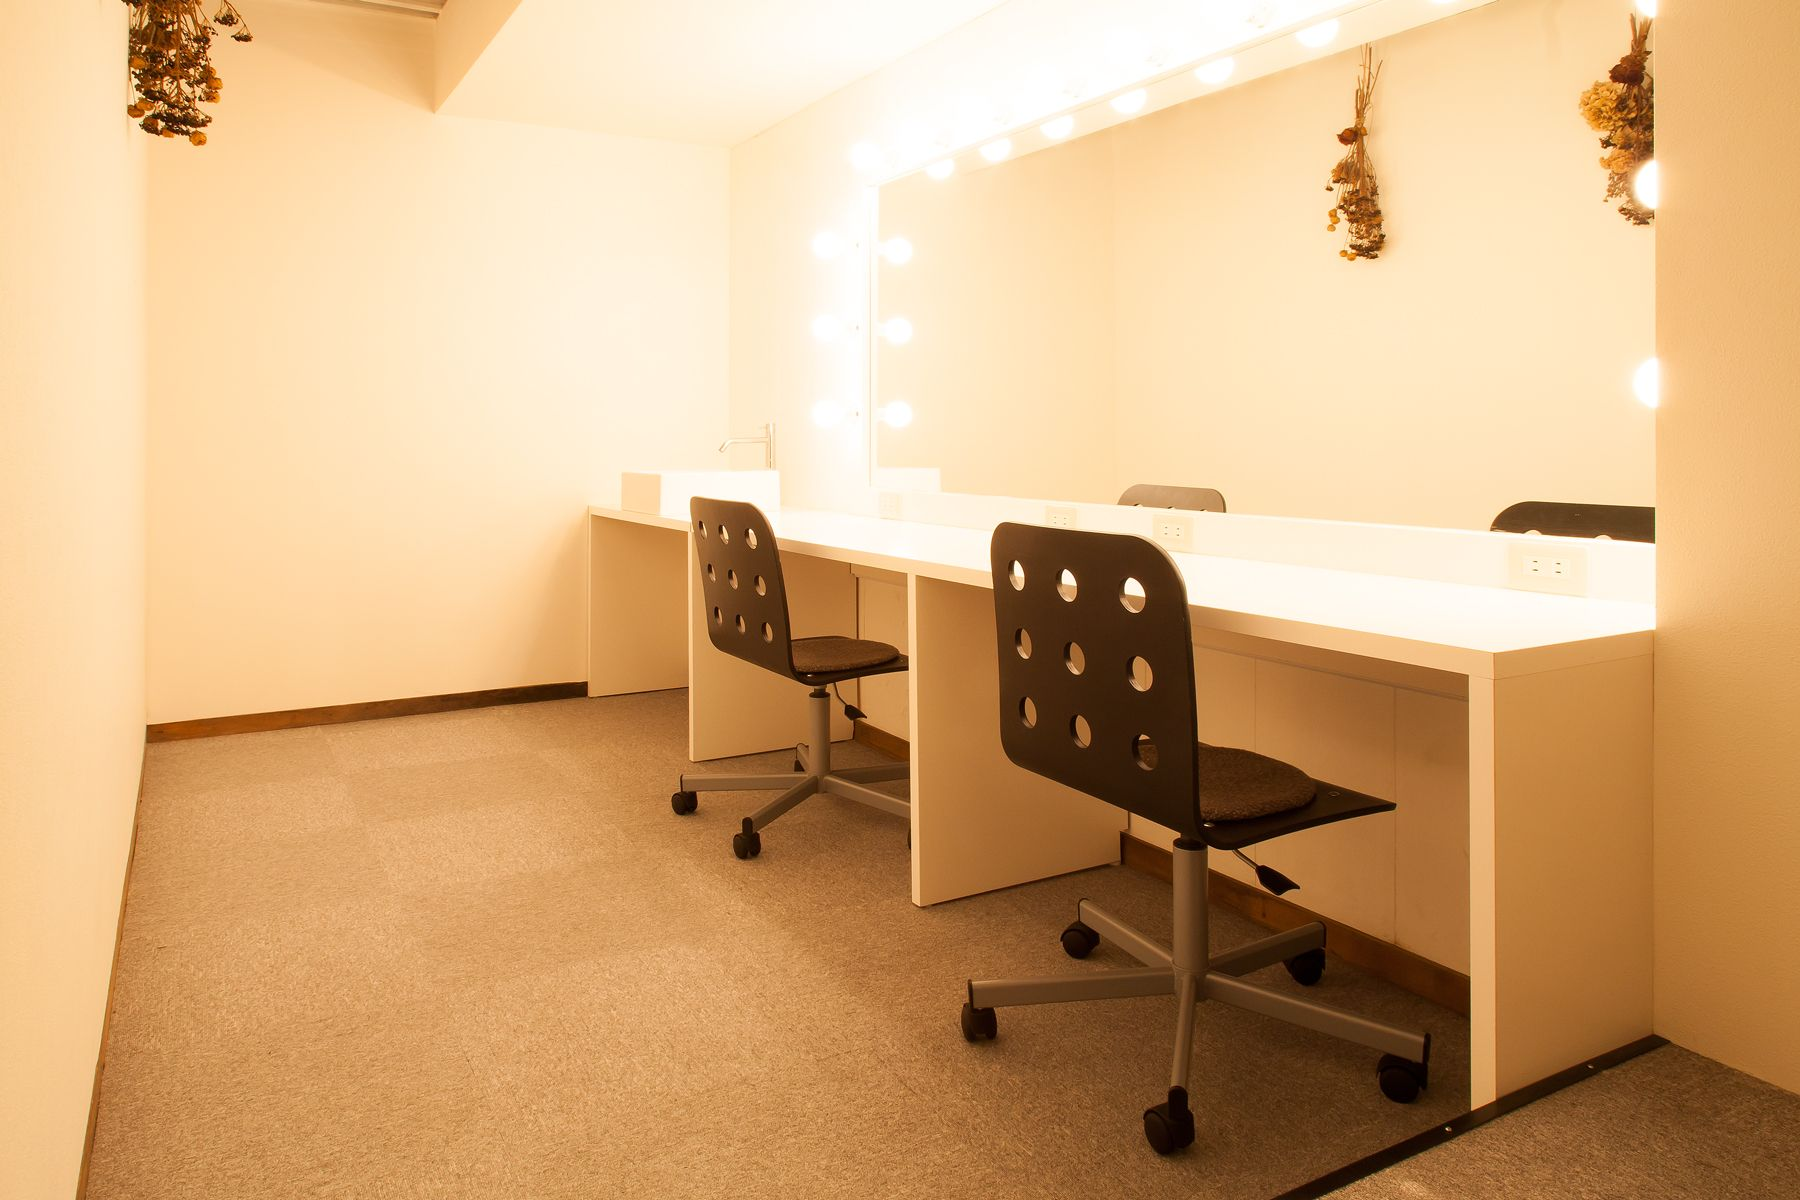 debolbe Studio&Warehouse (ディボルブ スタジオ)メイクルーム